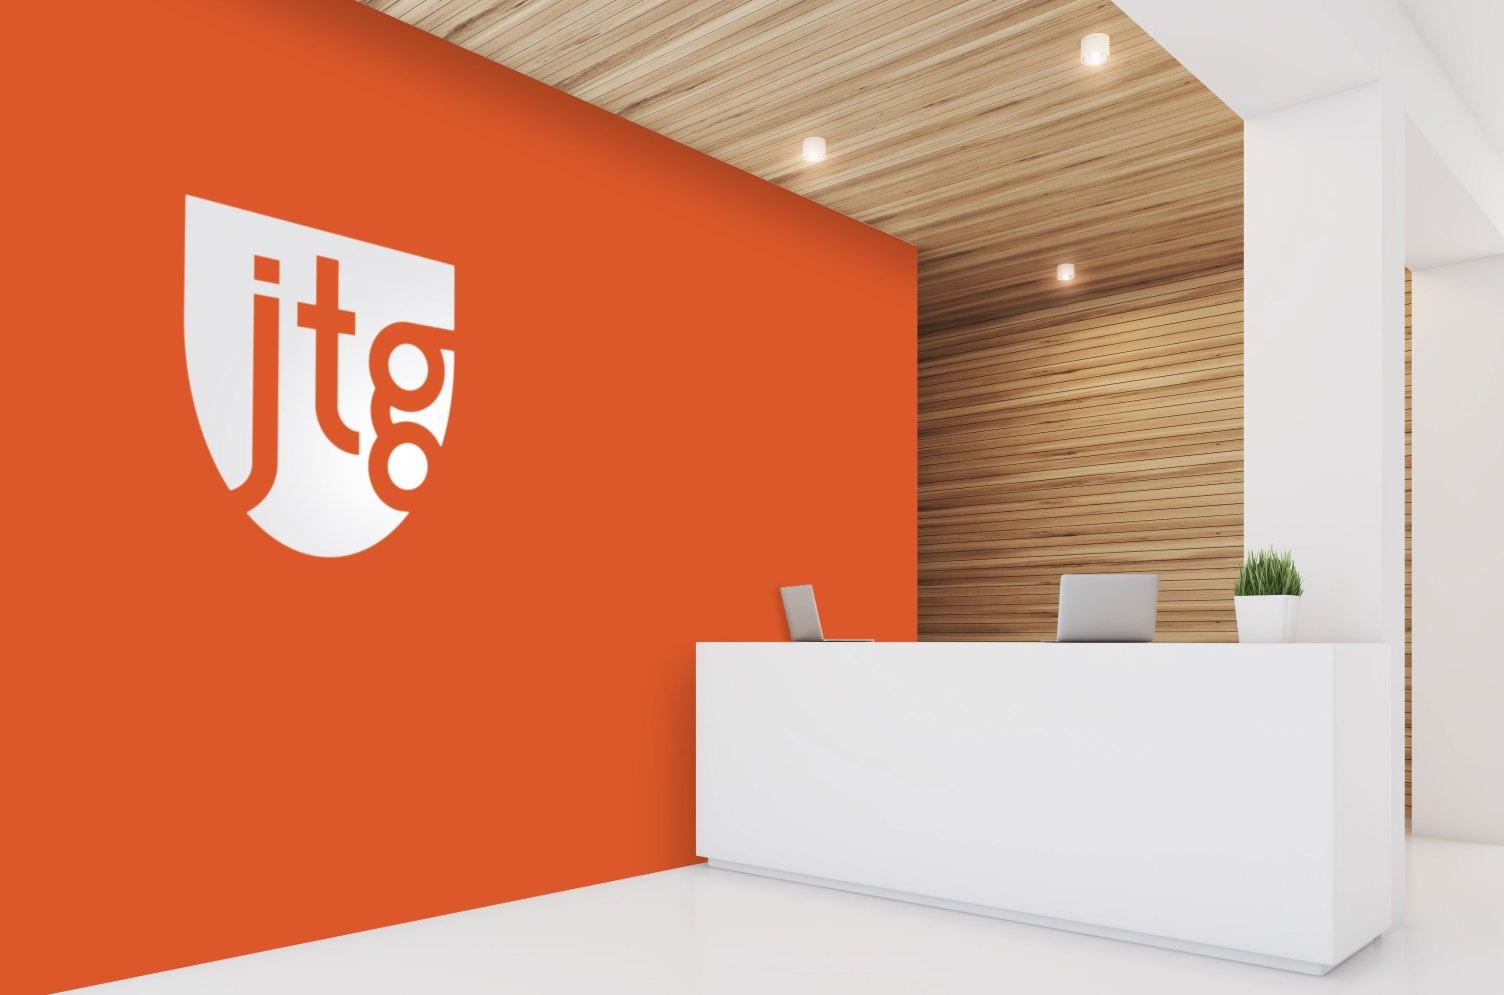 JTG, inc. office lobby